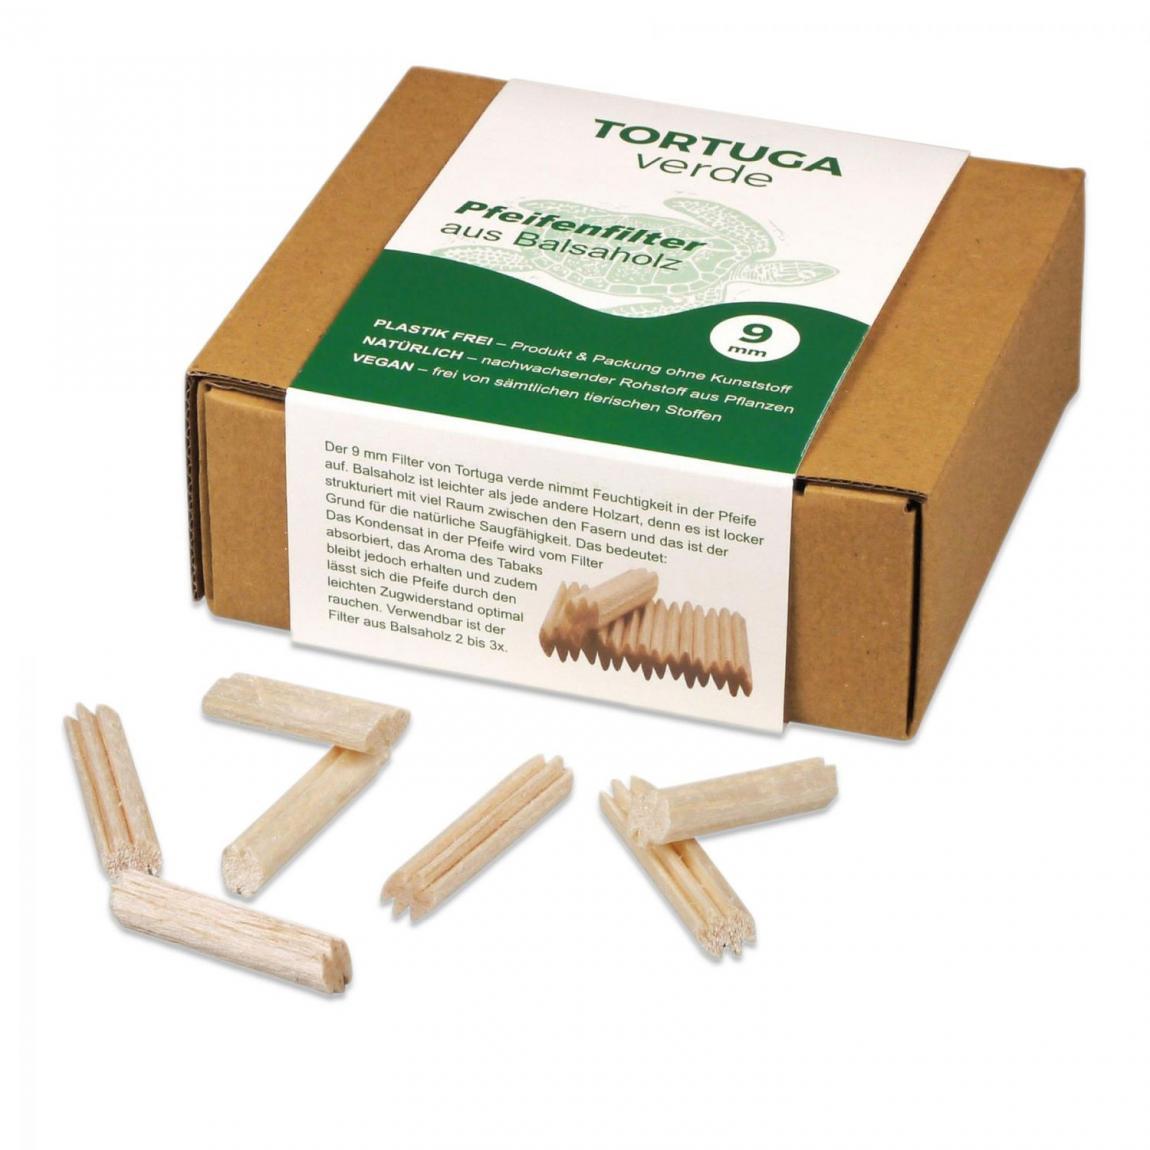 »Tortuga verde« Balsaholz-Filter 9mm, 110er Box